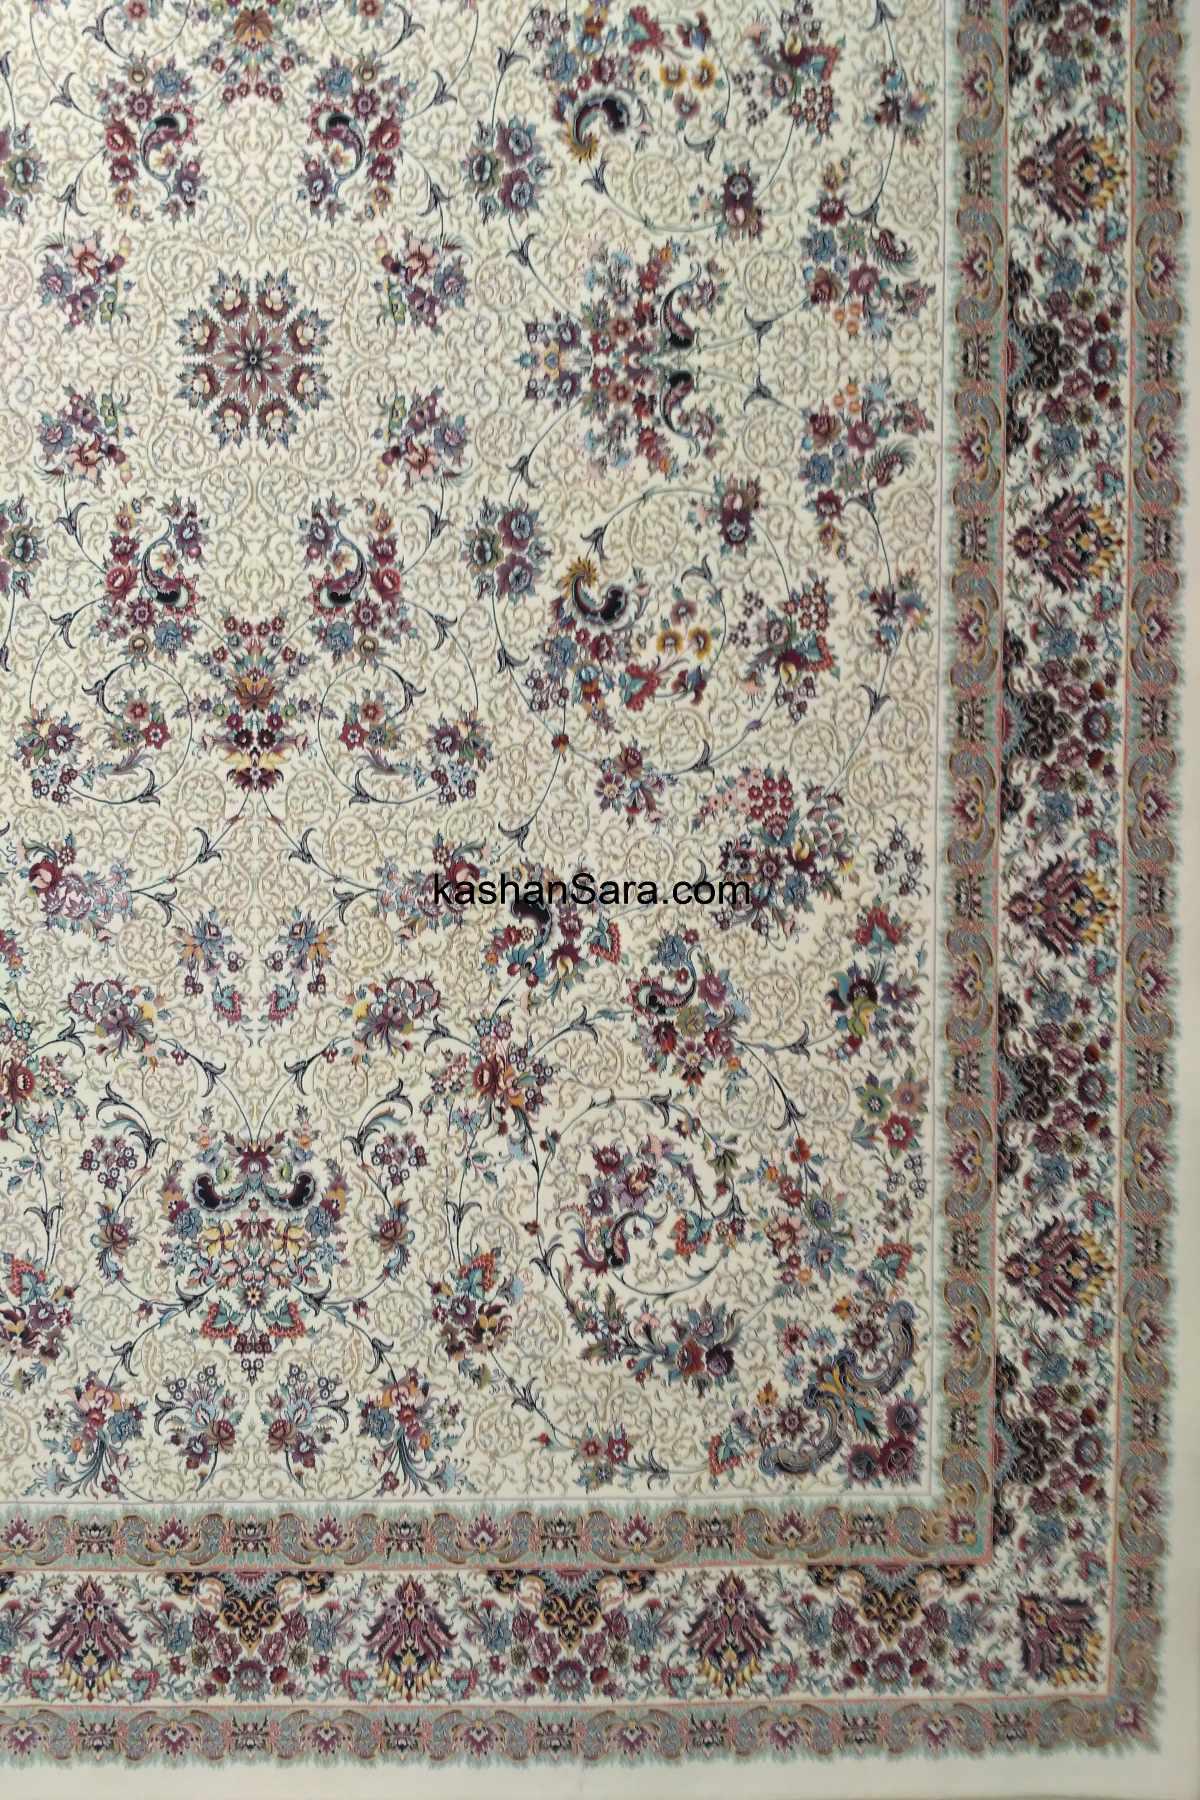 فرش ماشینی ۱۲۰۰ شانه کاشان طرح زنبق